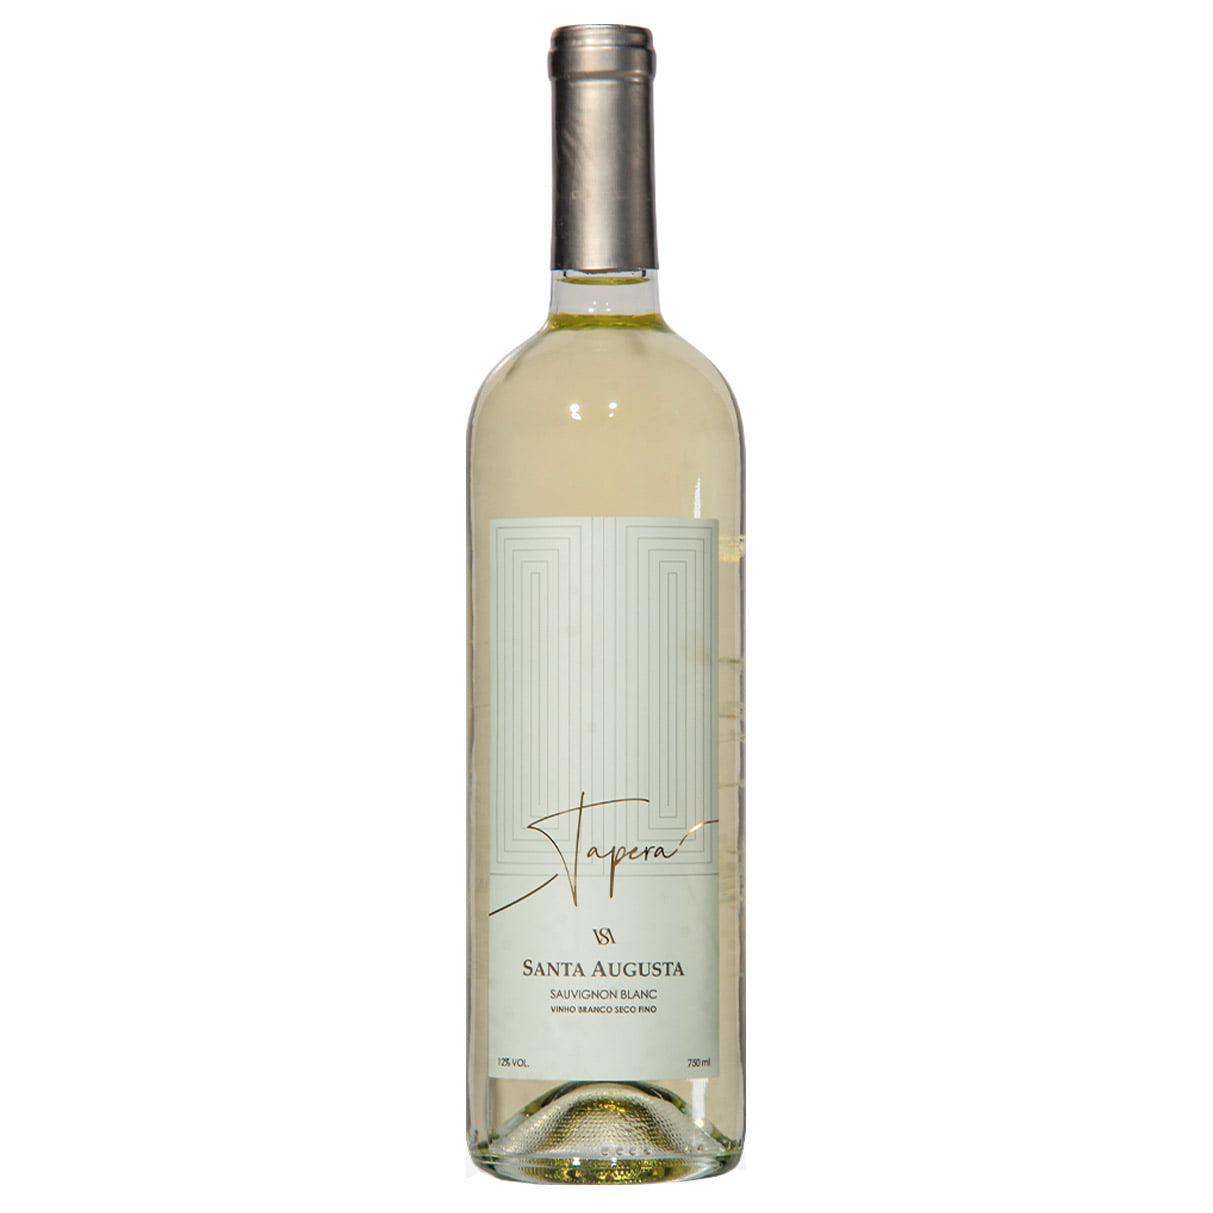 Santa Augusta Tapera Sauvignon Blanc 2020